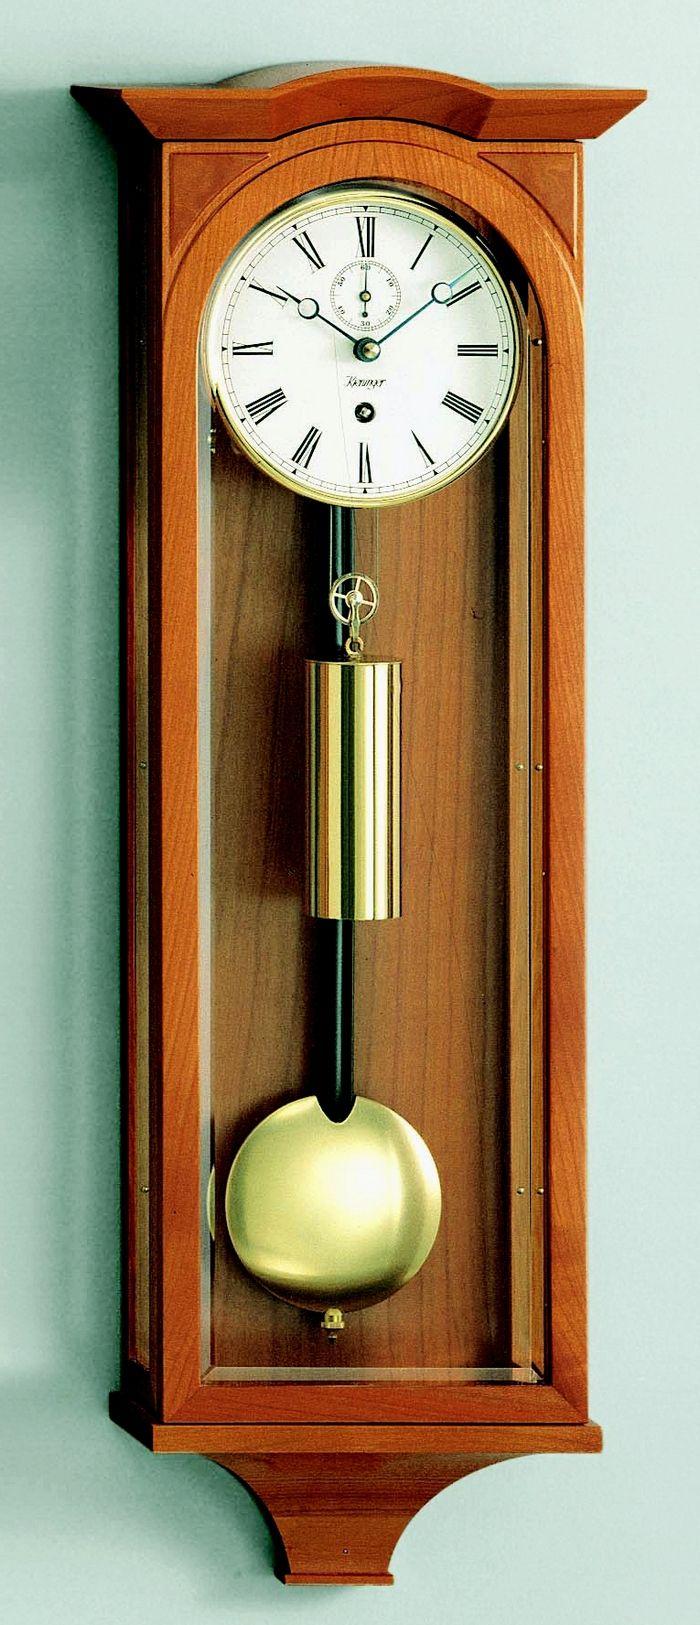 Kieninger Schubert Mechanical Weight Driven Regulator Wall Clock 2803 41 01 S Izobrazheniyami Nastennye Chasy Chasy Aerofotosemka